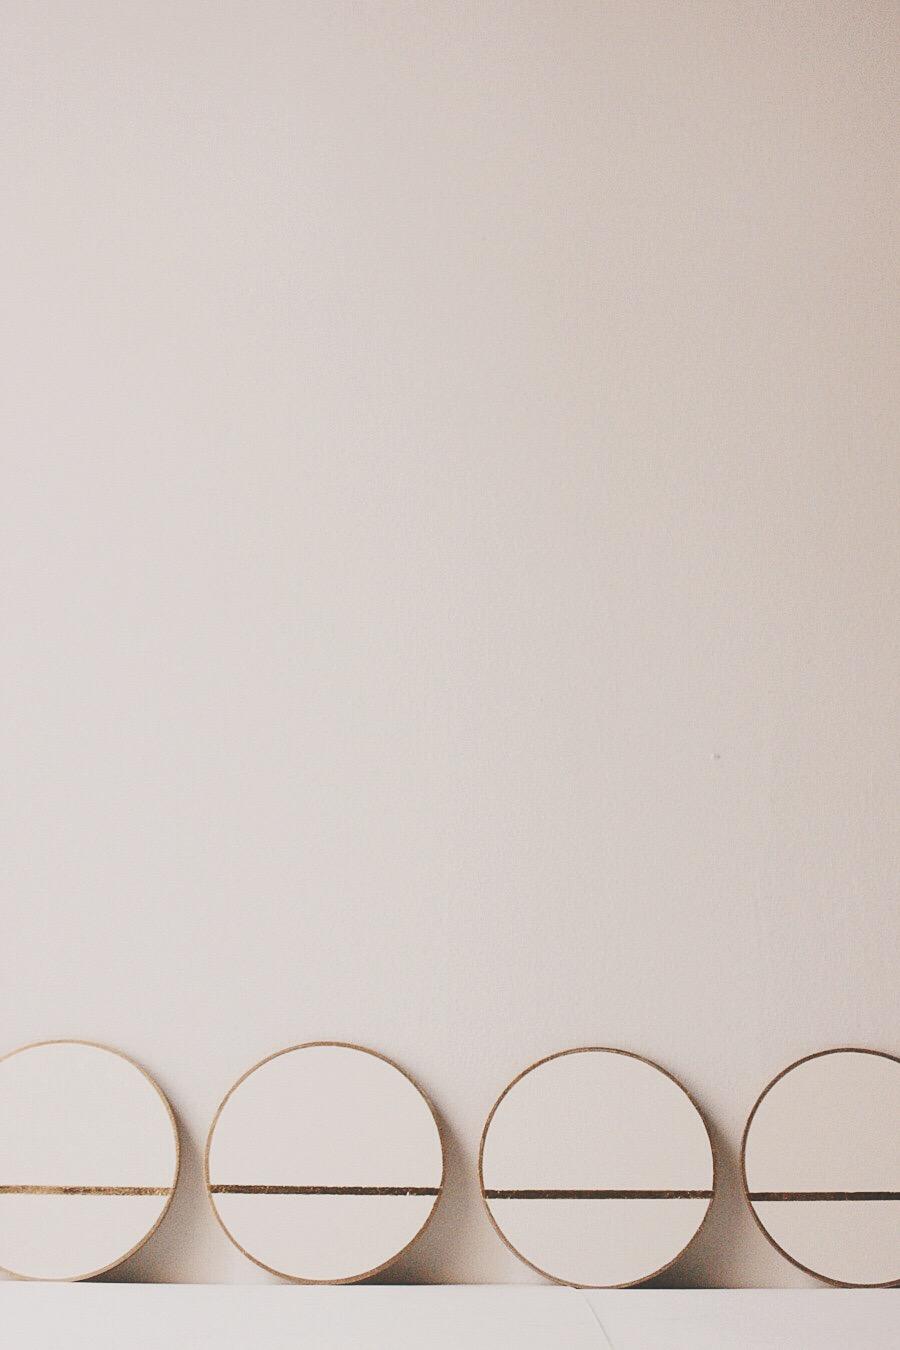 linea+coasters+white+the+vintage+vogue1.jpeg